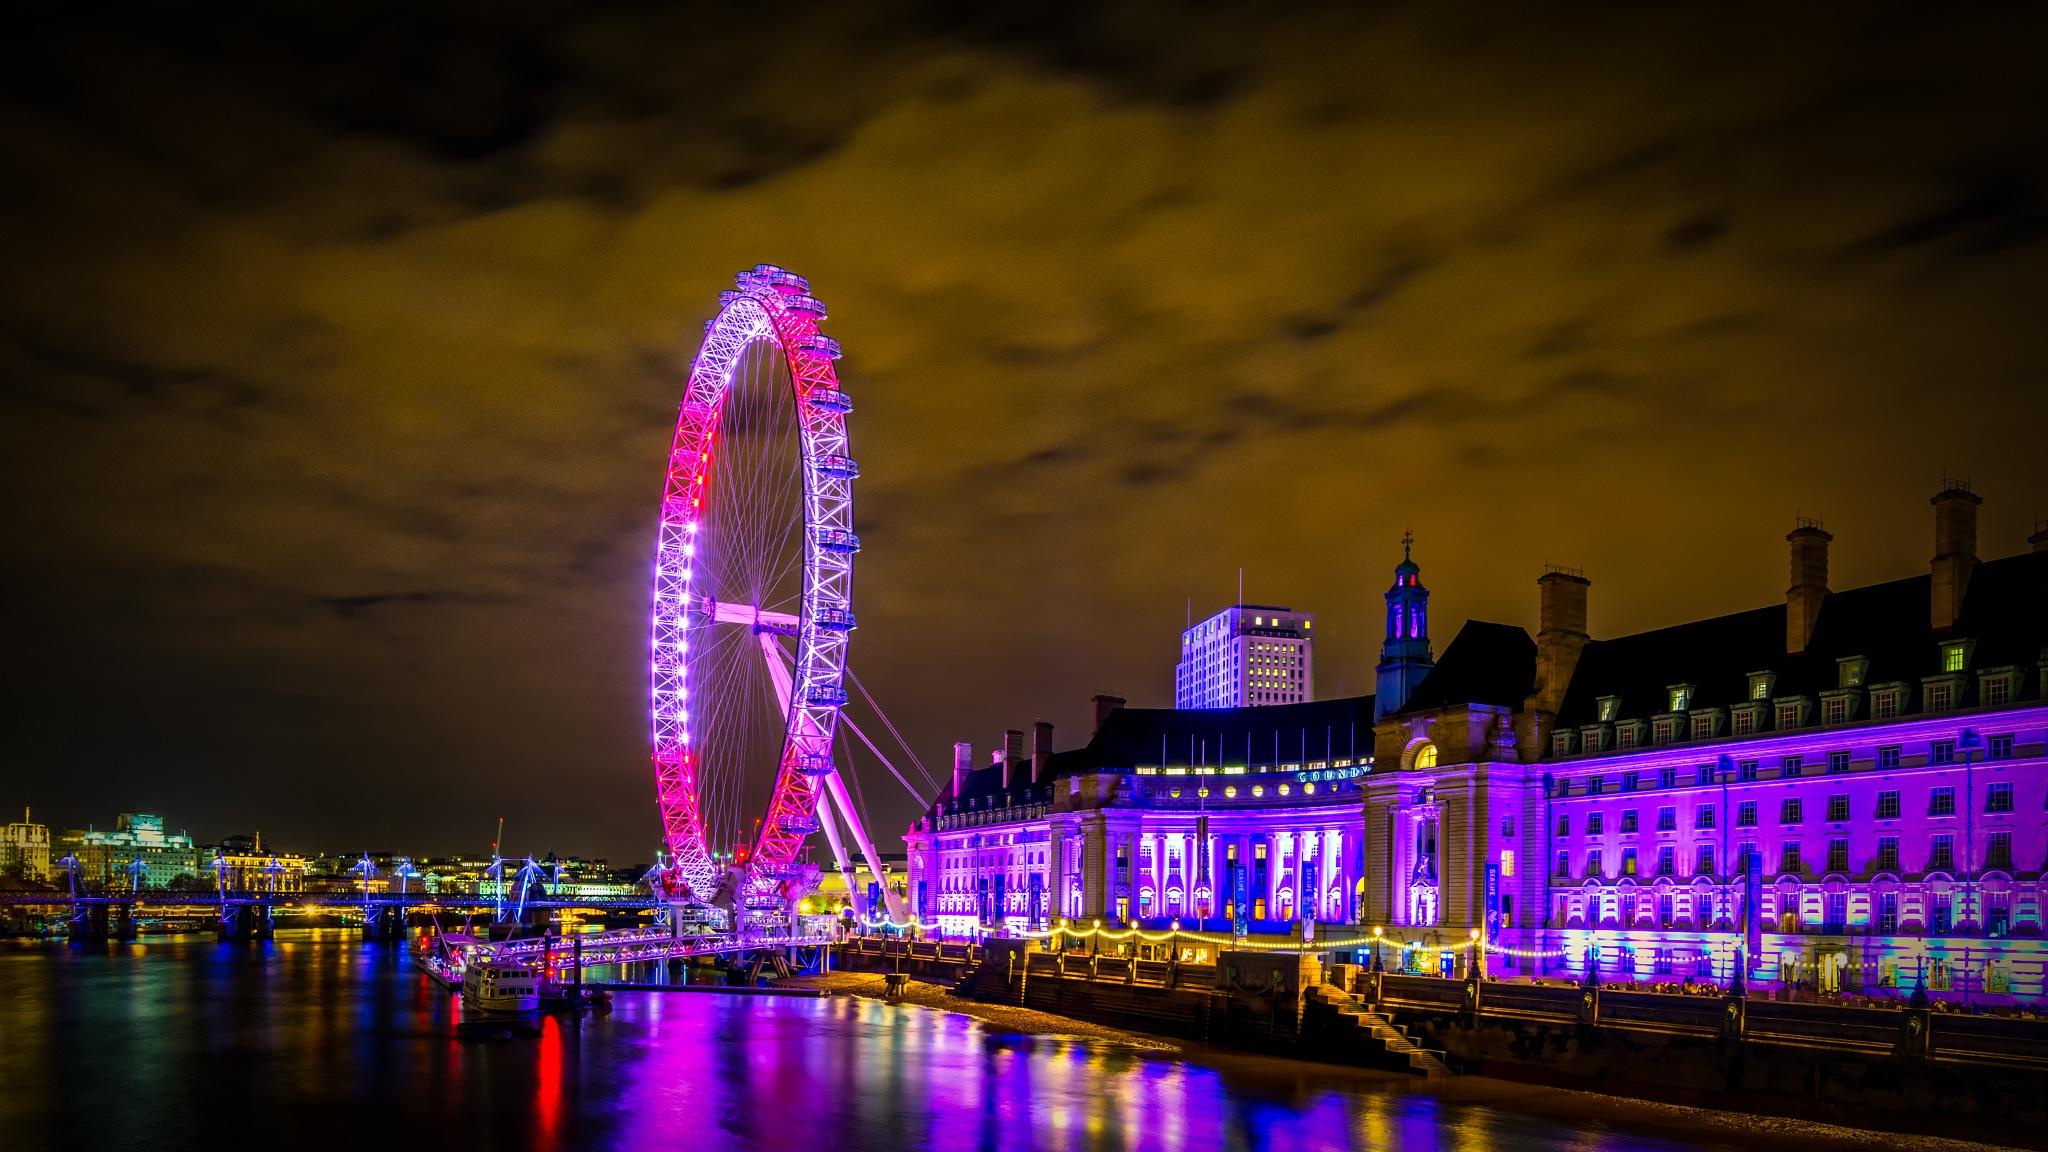 London Eye by Darko Maretić